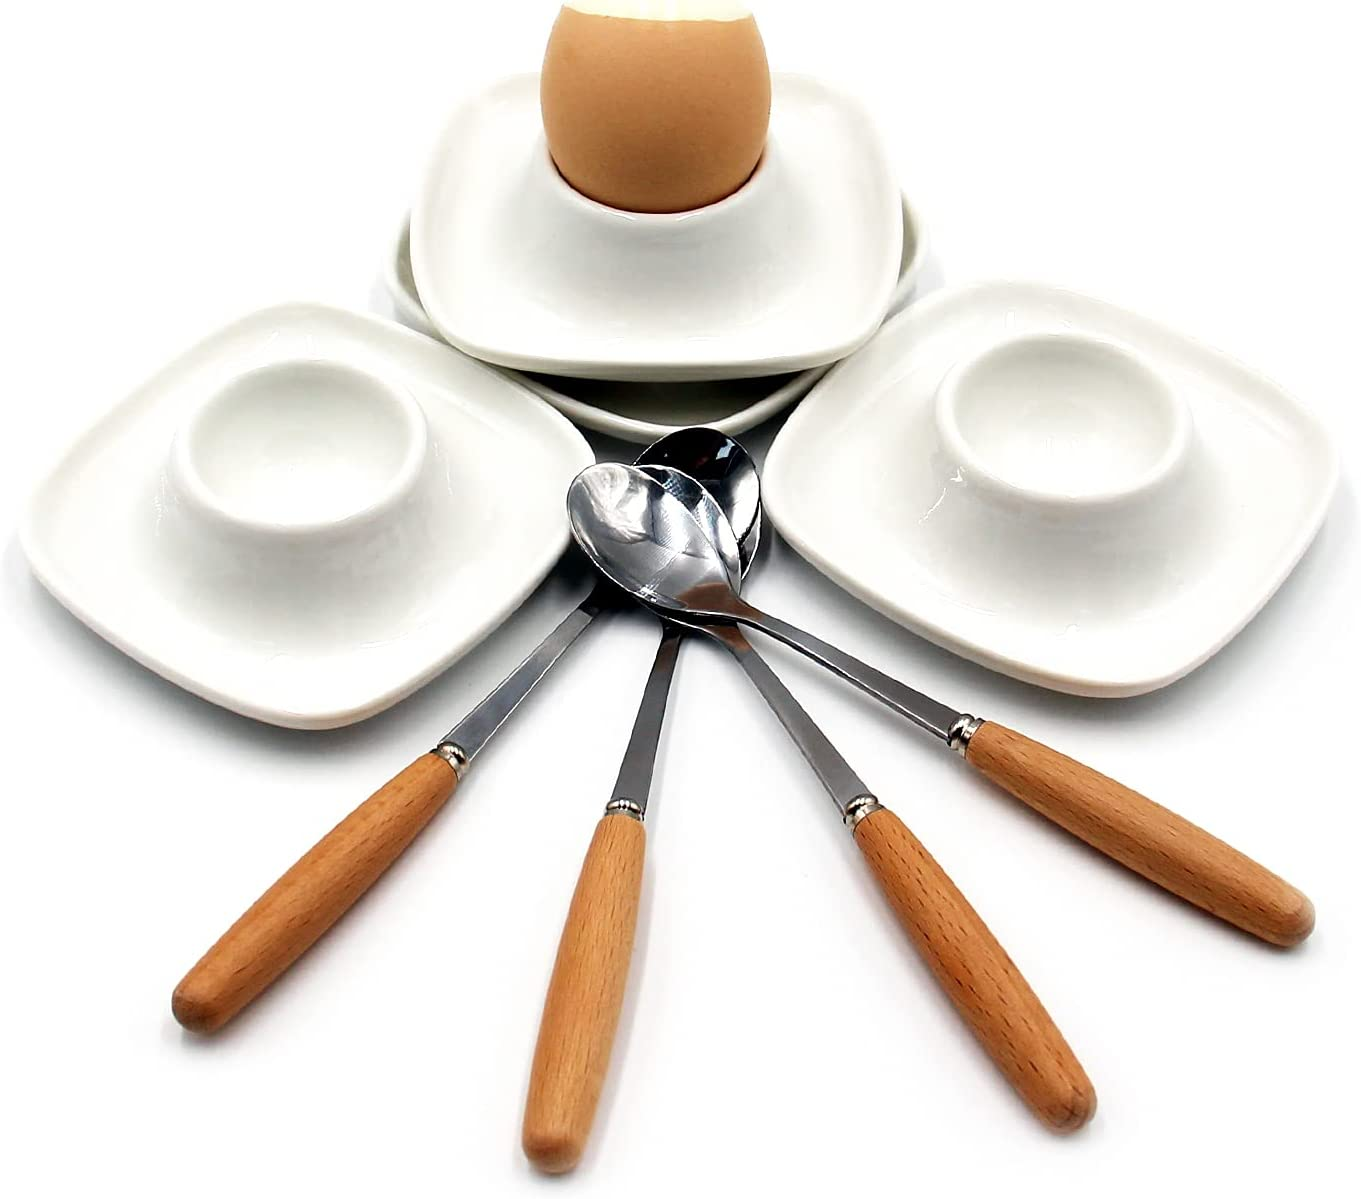 JAMOR Square Egg Tray Set White Ceram Fashionable Porcelain Cup New mail order